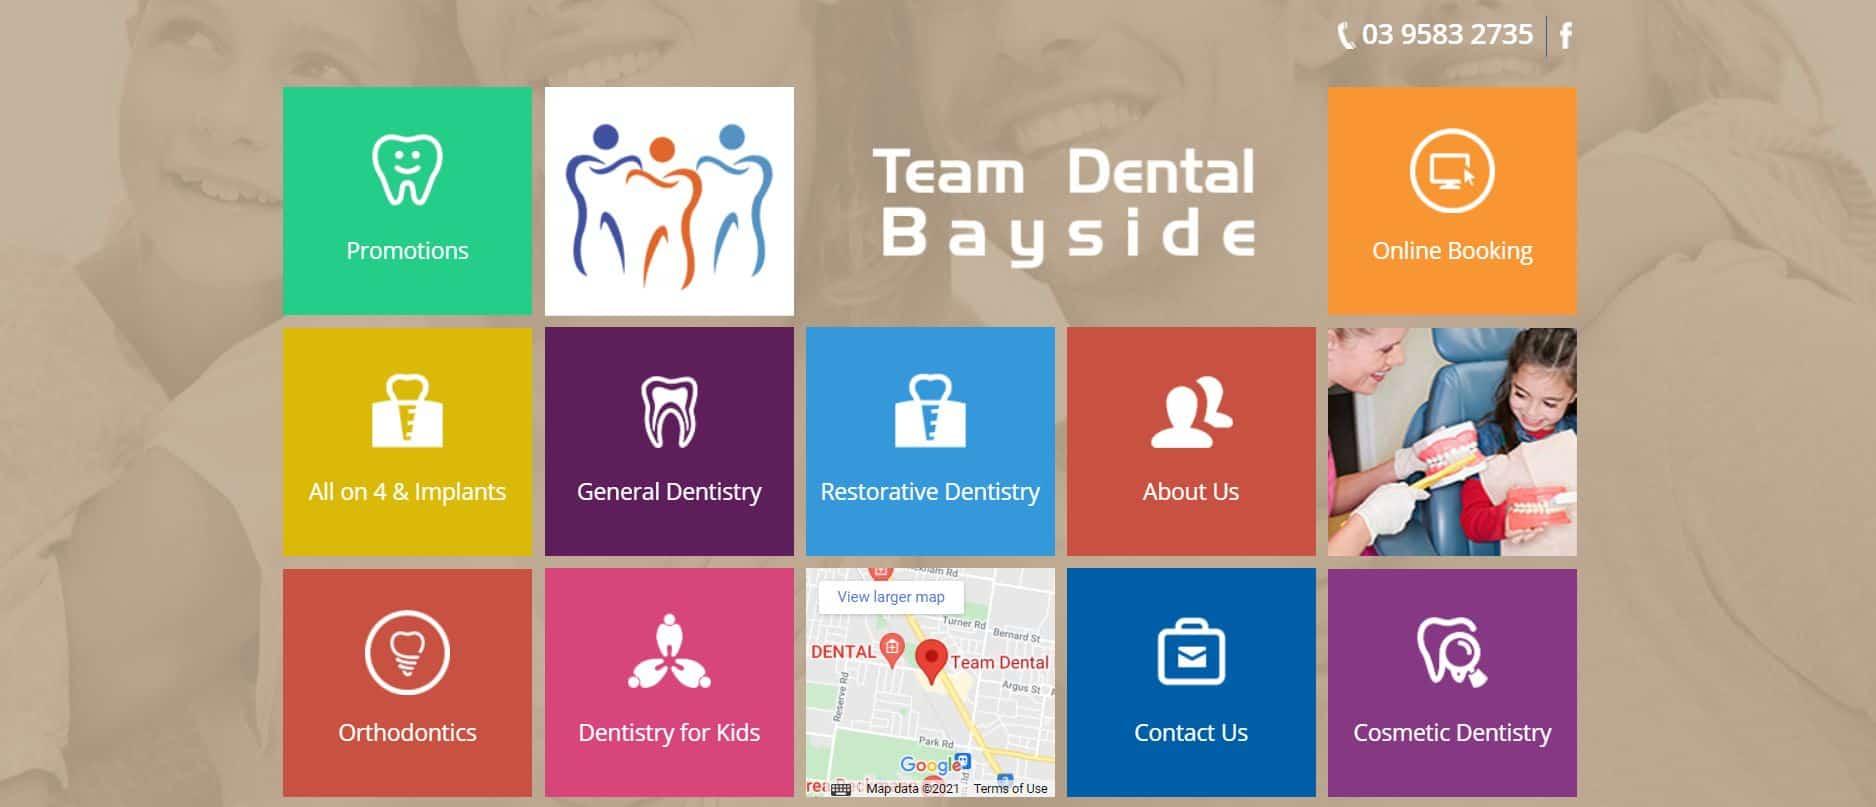 team dental bayside